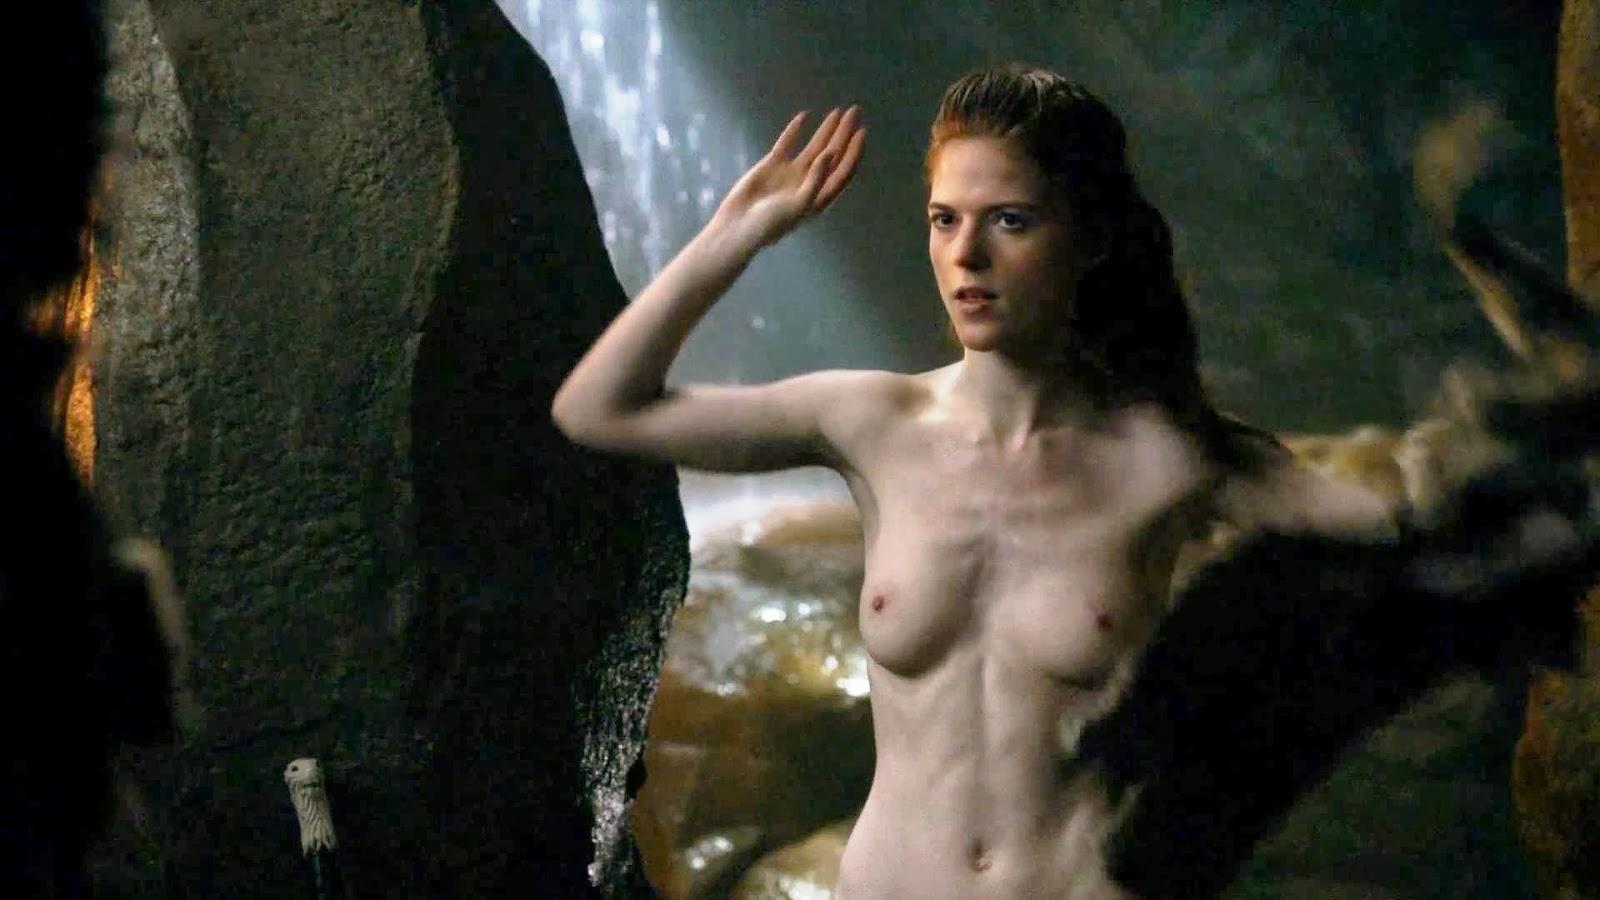 rose-leslie-nude-body-in-the-game-of-thrones.jpg